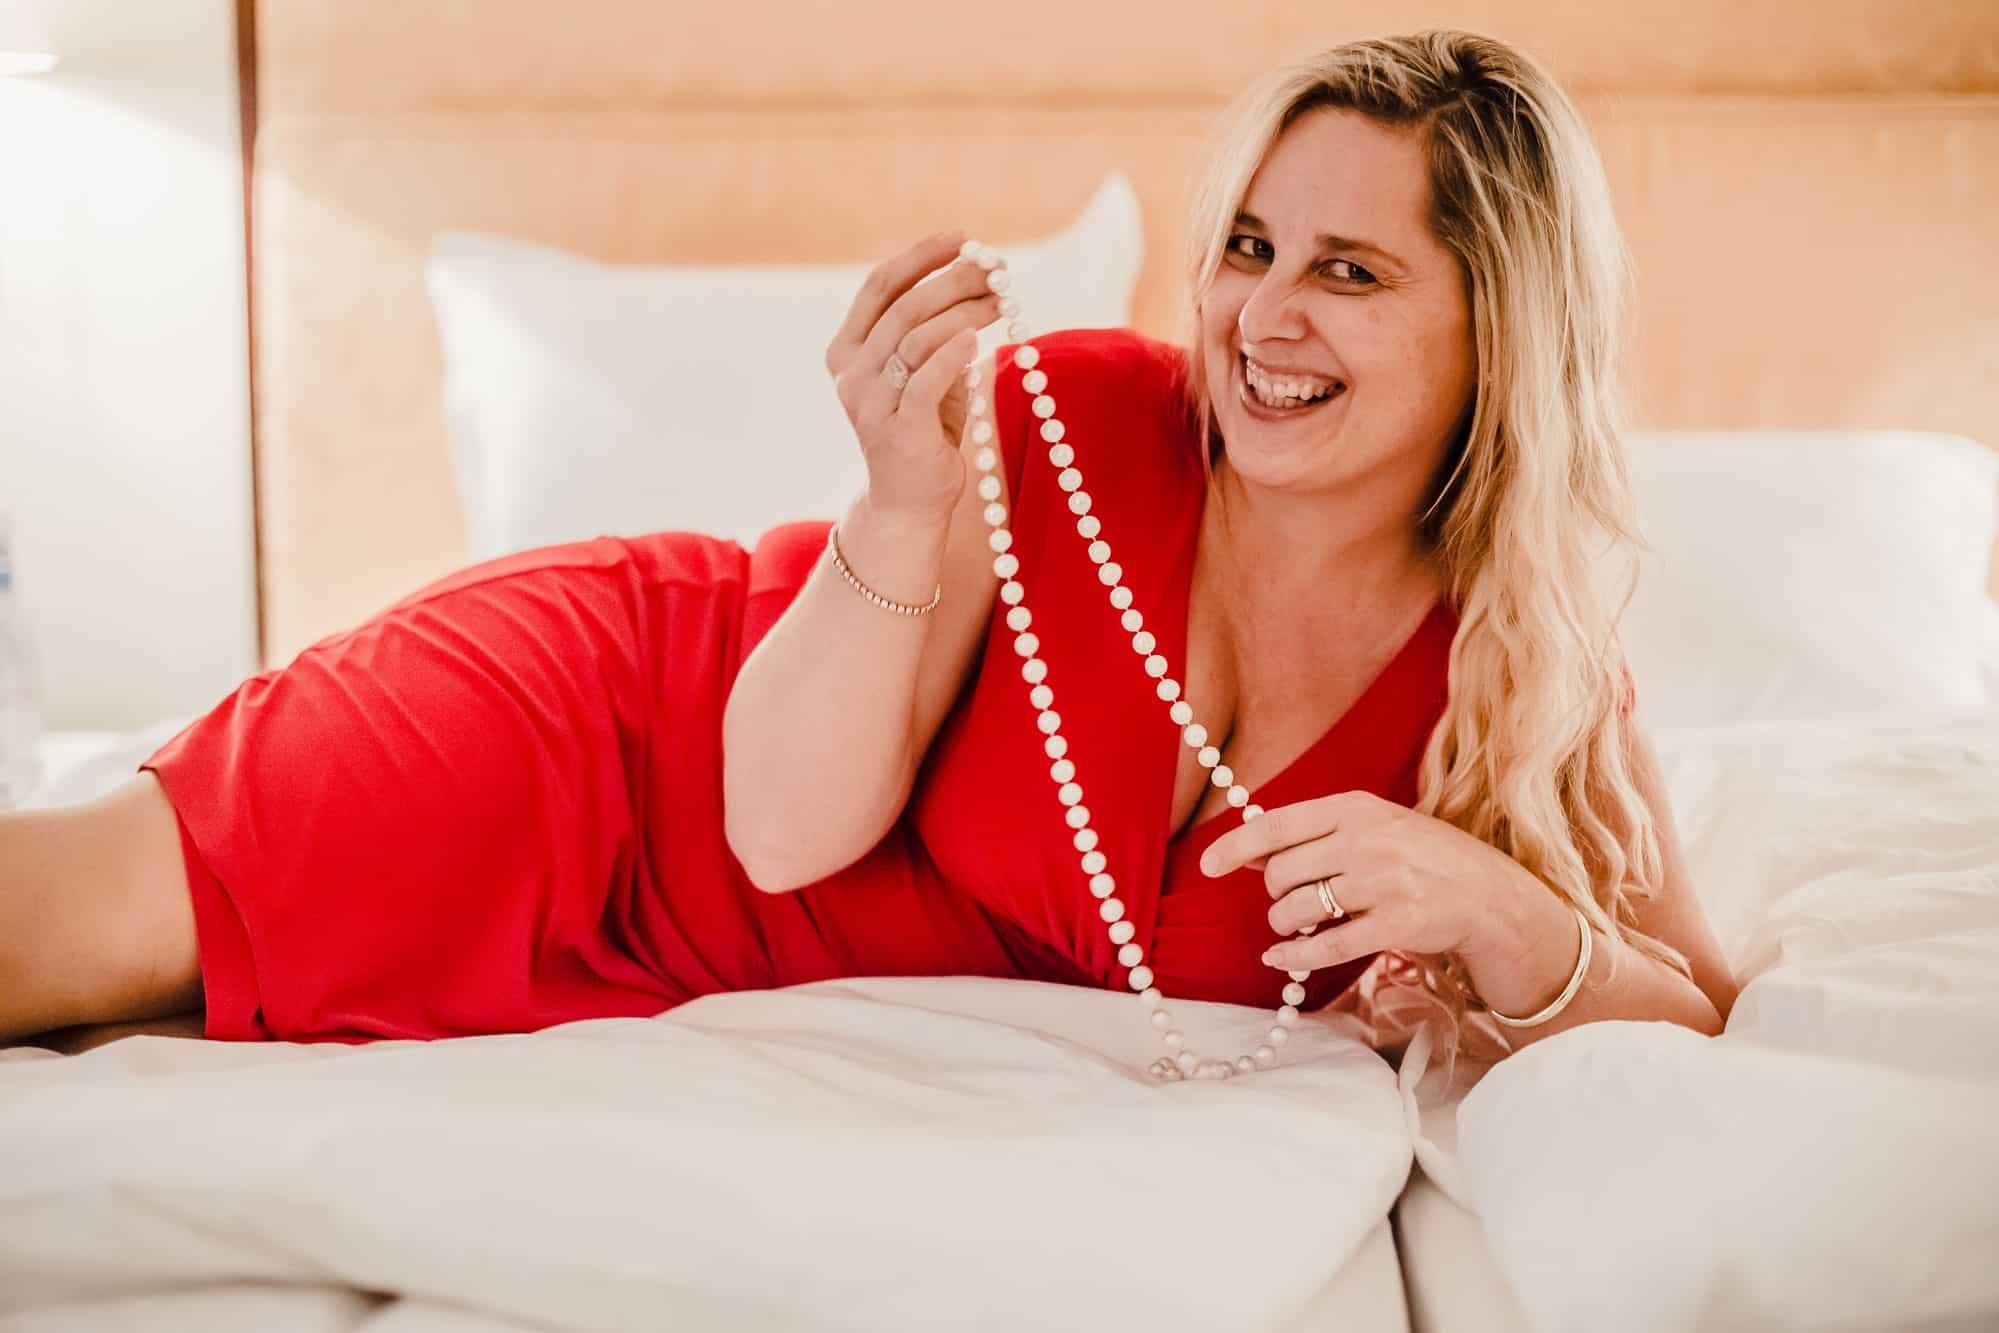 https://magic-businessladys.com/wp-content/uploads/2019/04/magicbusinessladys_Reichtum_Schmuck_Sabine-Pehnack.jpg